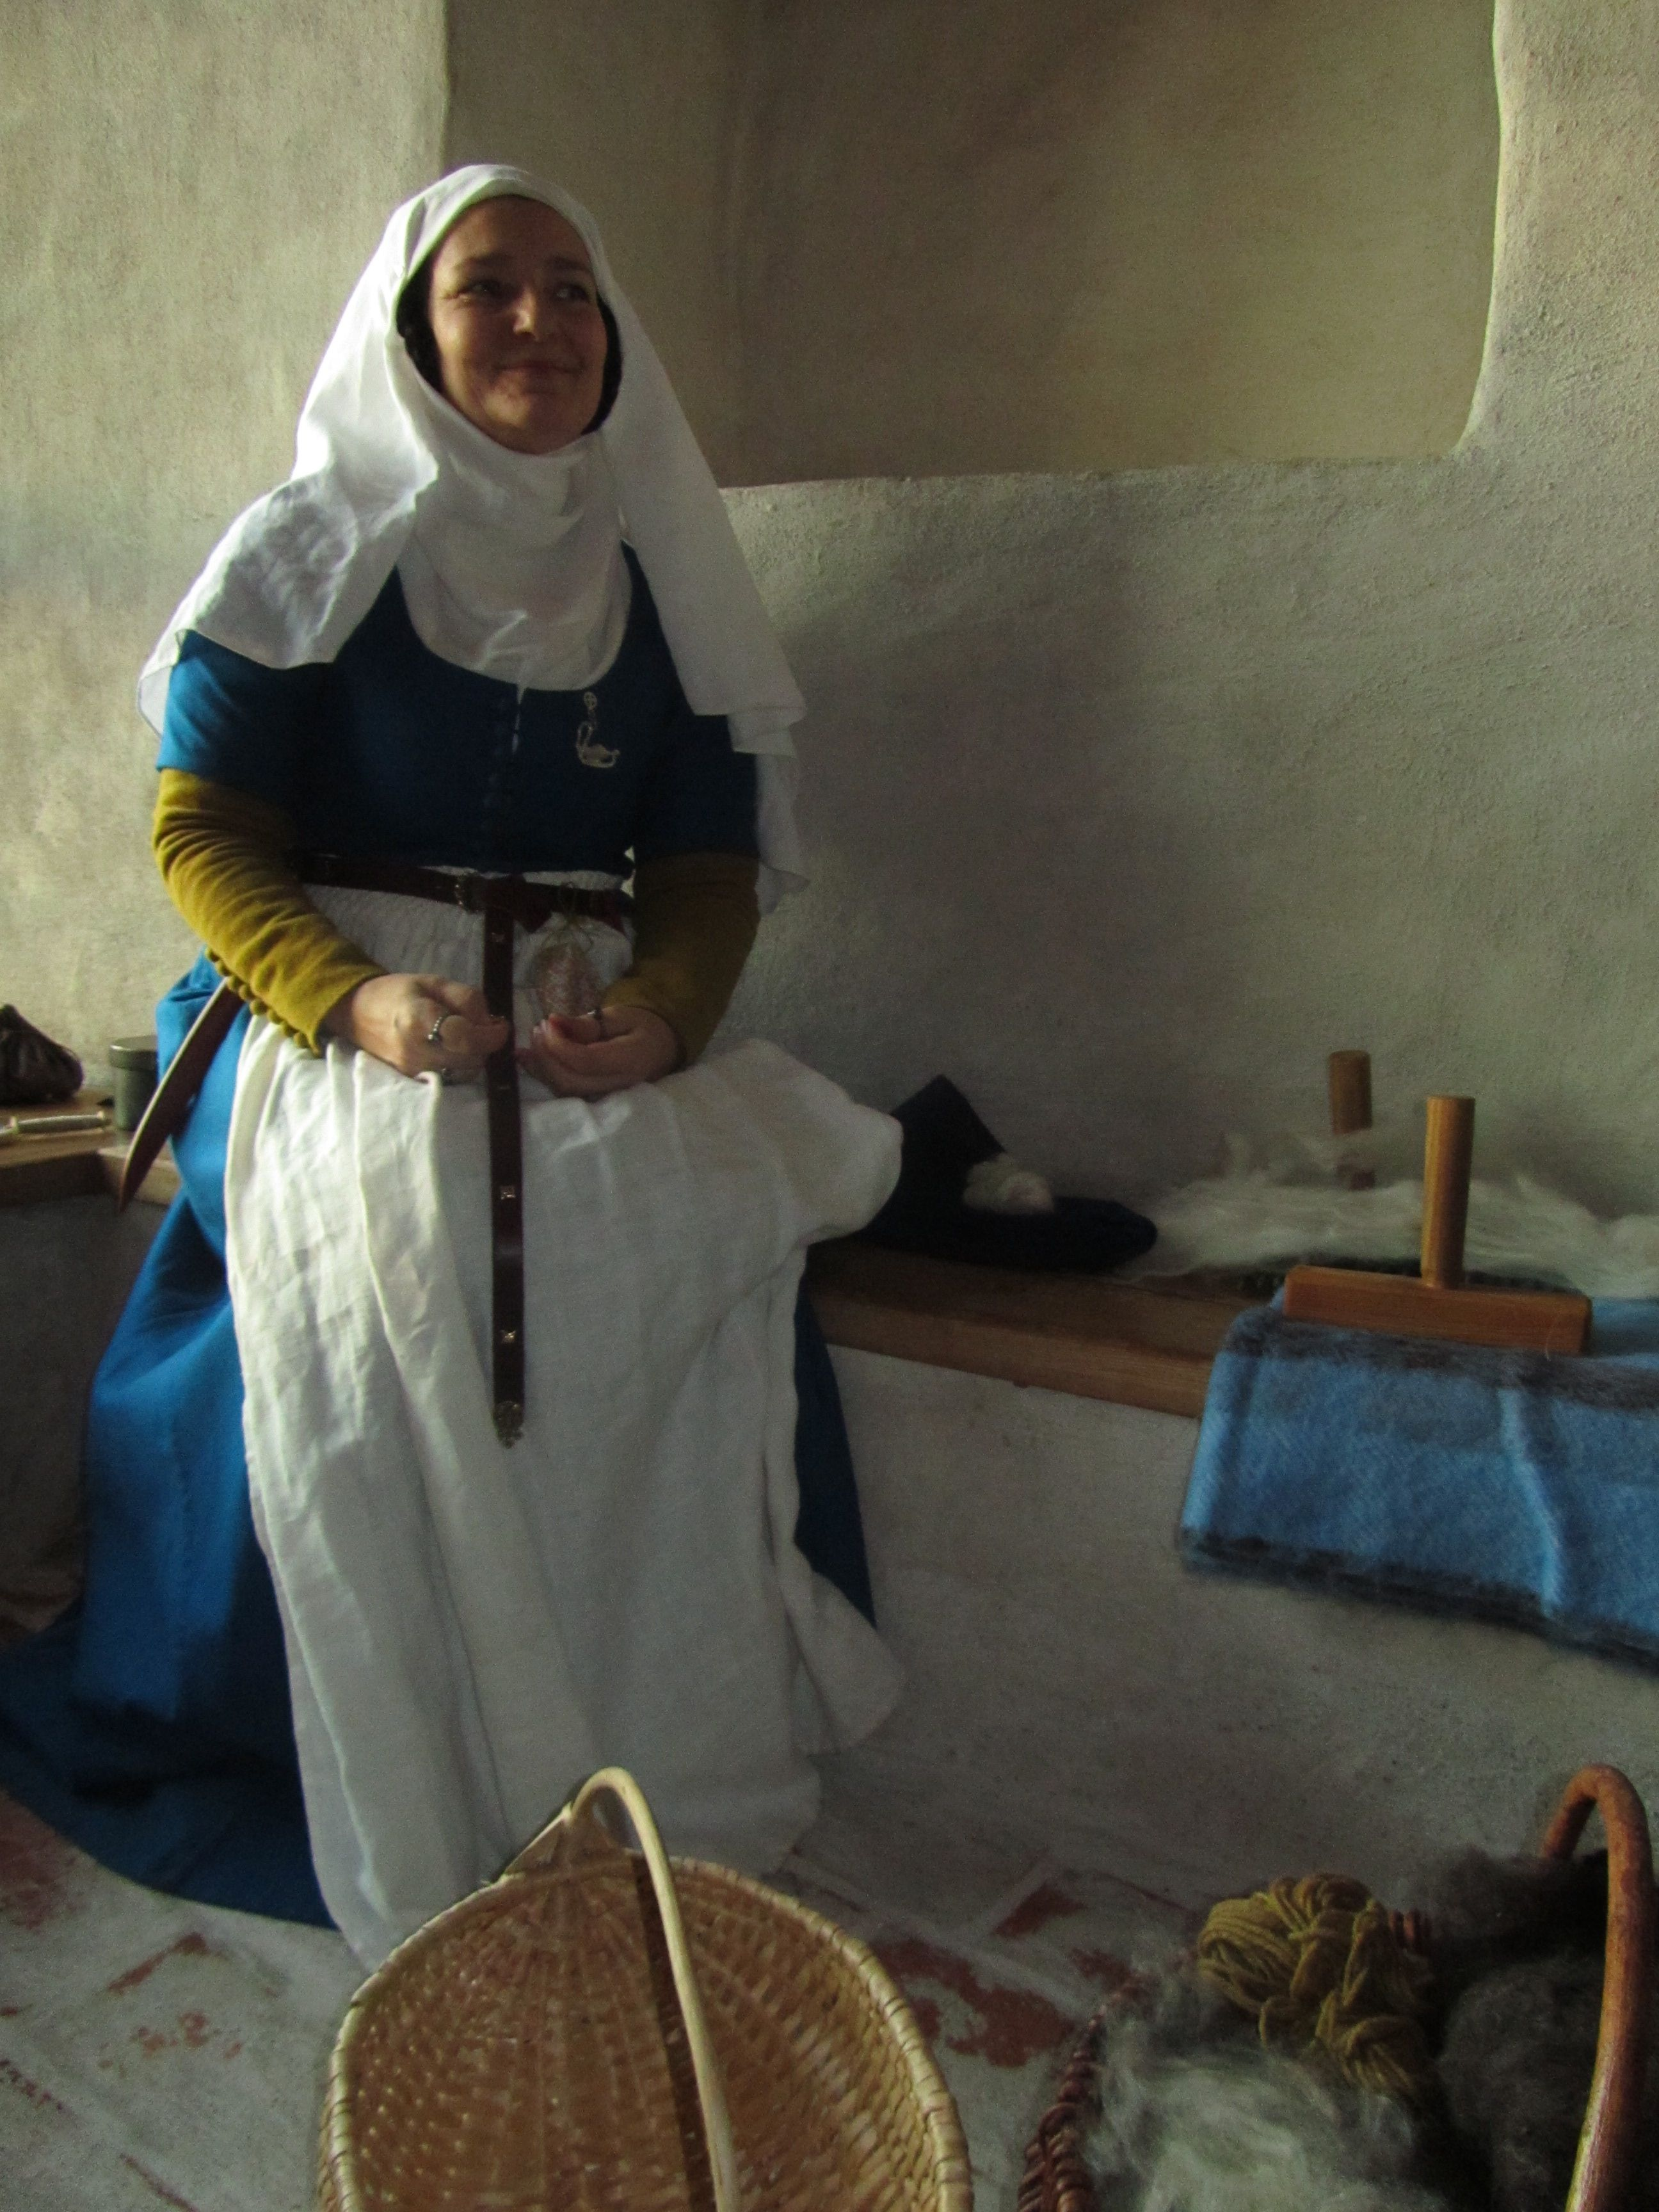 Vaatteita | Clothing | Swan River Crafts